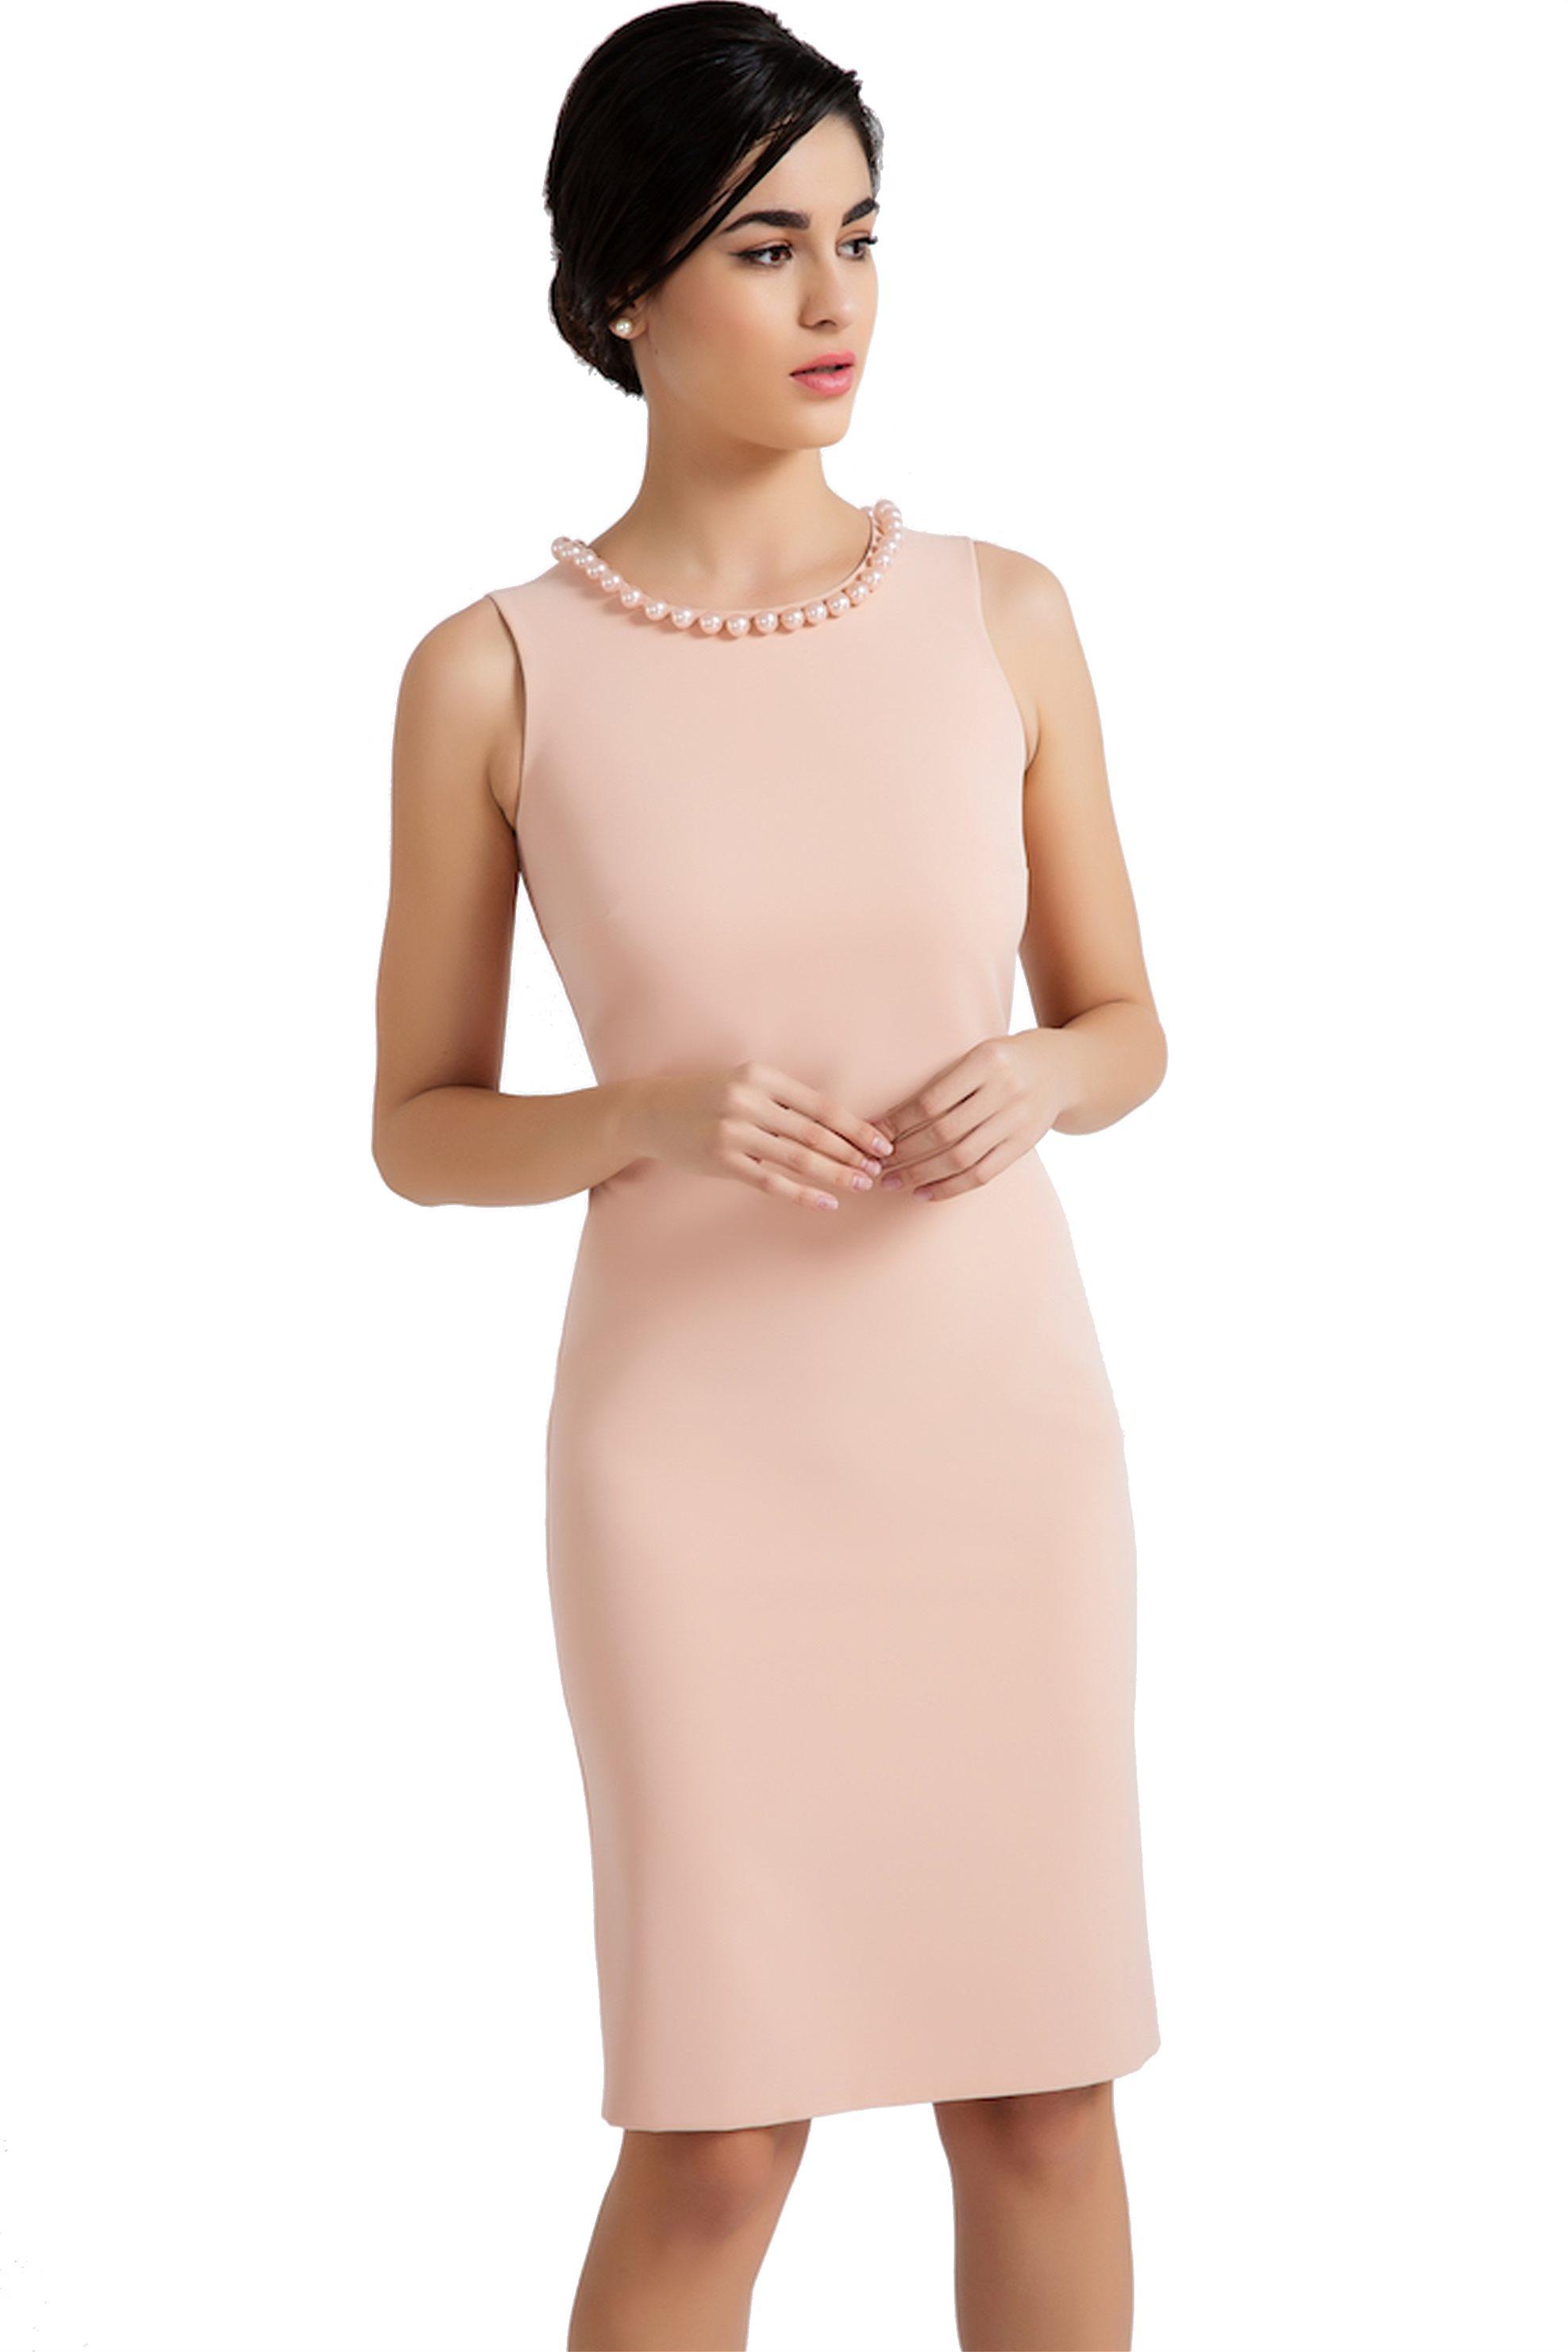 64b73fadeea6 Γυναικεία   Ρούχα   Φορέματα   Καθημερινά   Γυναικείο αμάνικο ...